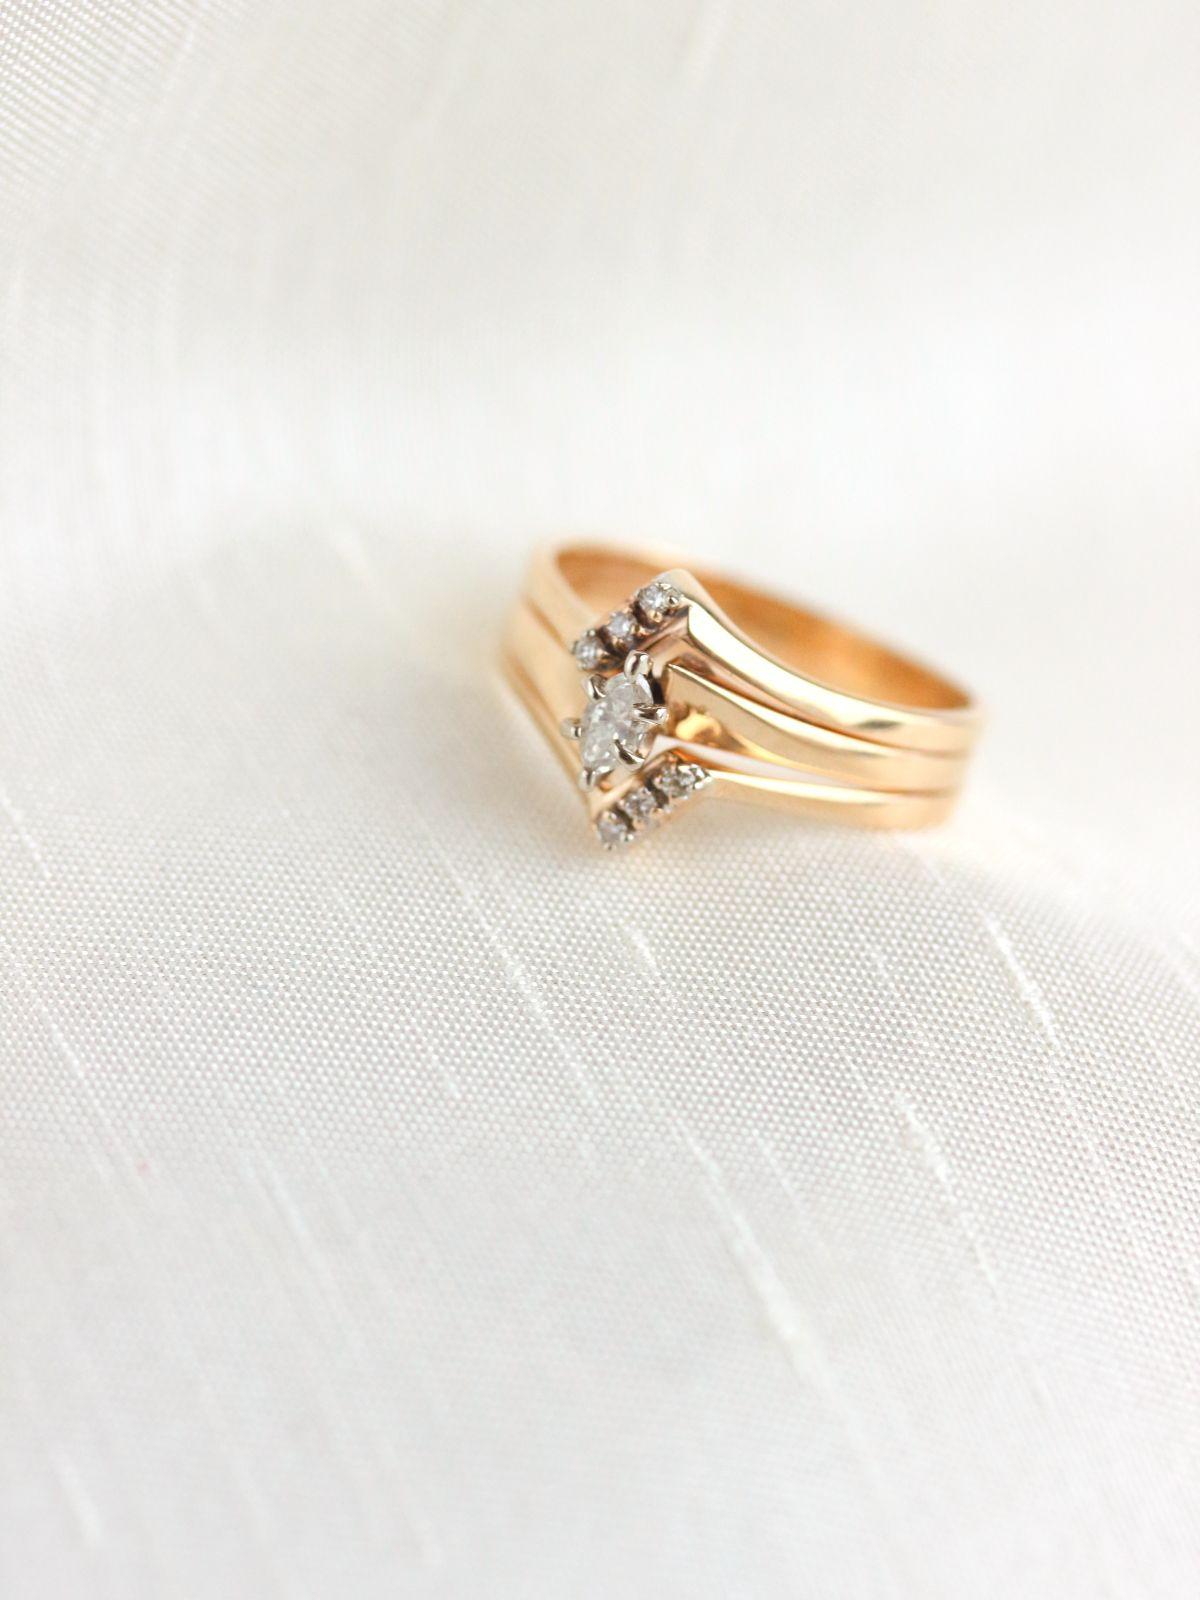 Pin By Latifa Dachraoui On Anneaux De Saphir Bleu In 2020 Round Brilliant Diamond Engagement Ring Diamond Engagement Rings Vintage Vintage Engagement Rings